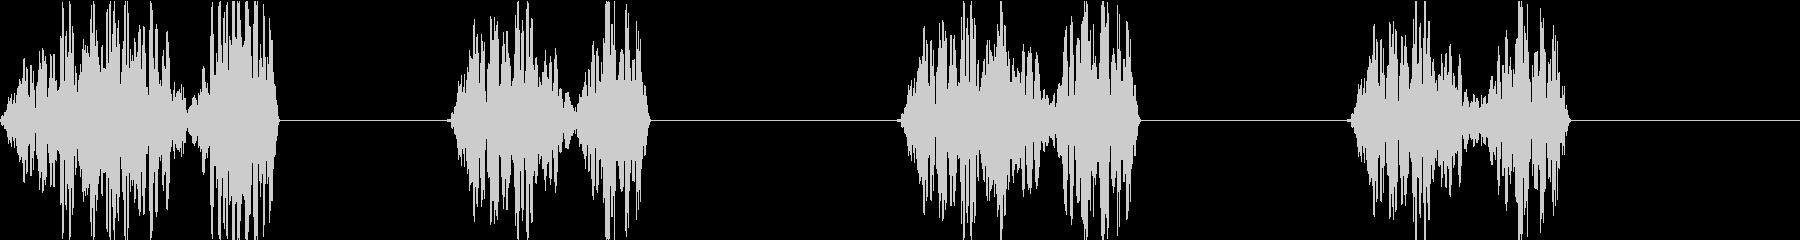 DJプレイ スクラッチ・ノイズ 248の未再生の波形